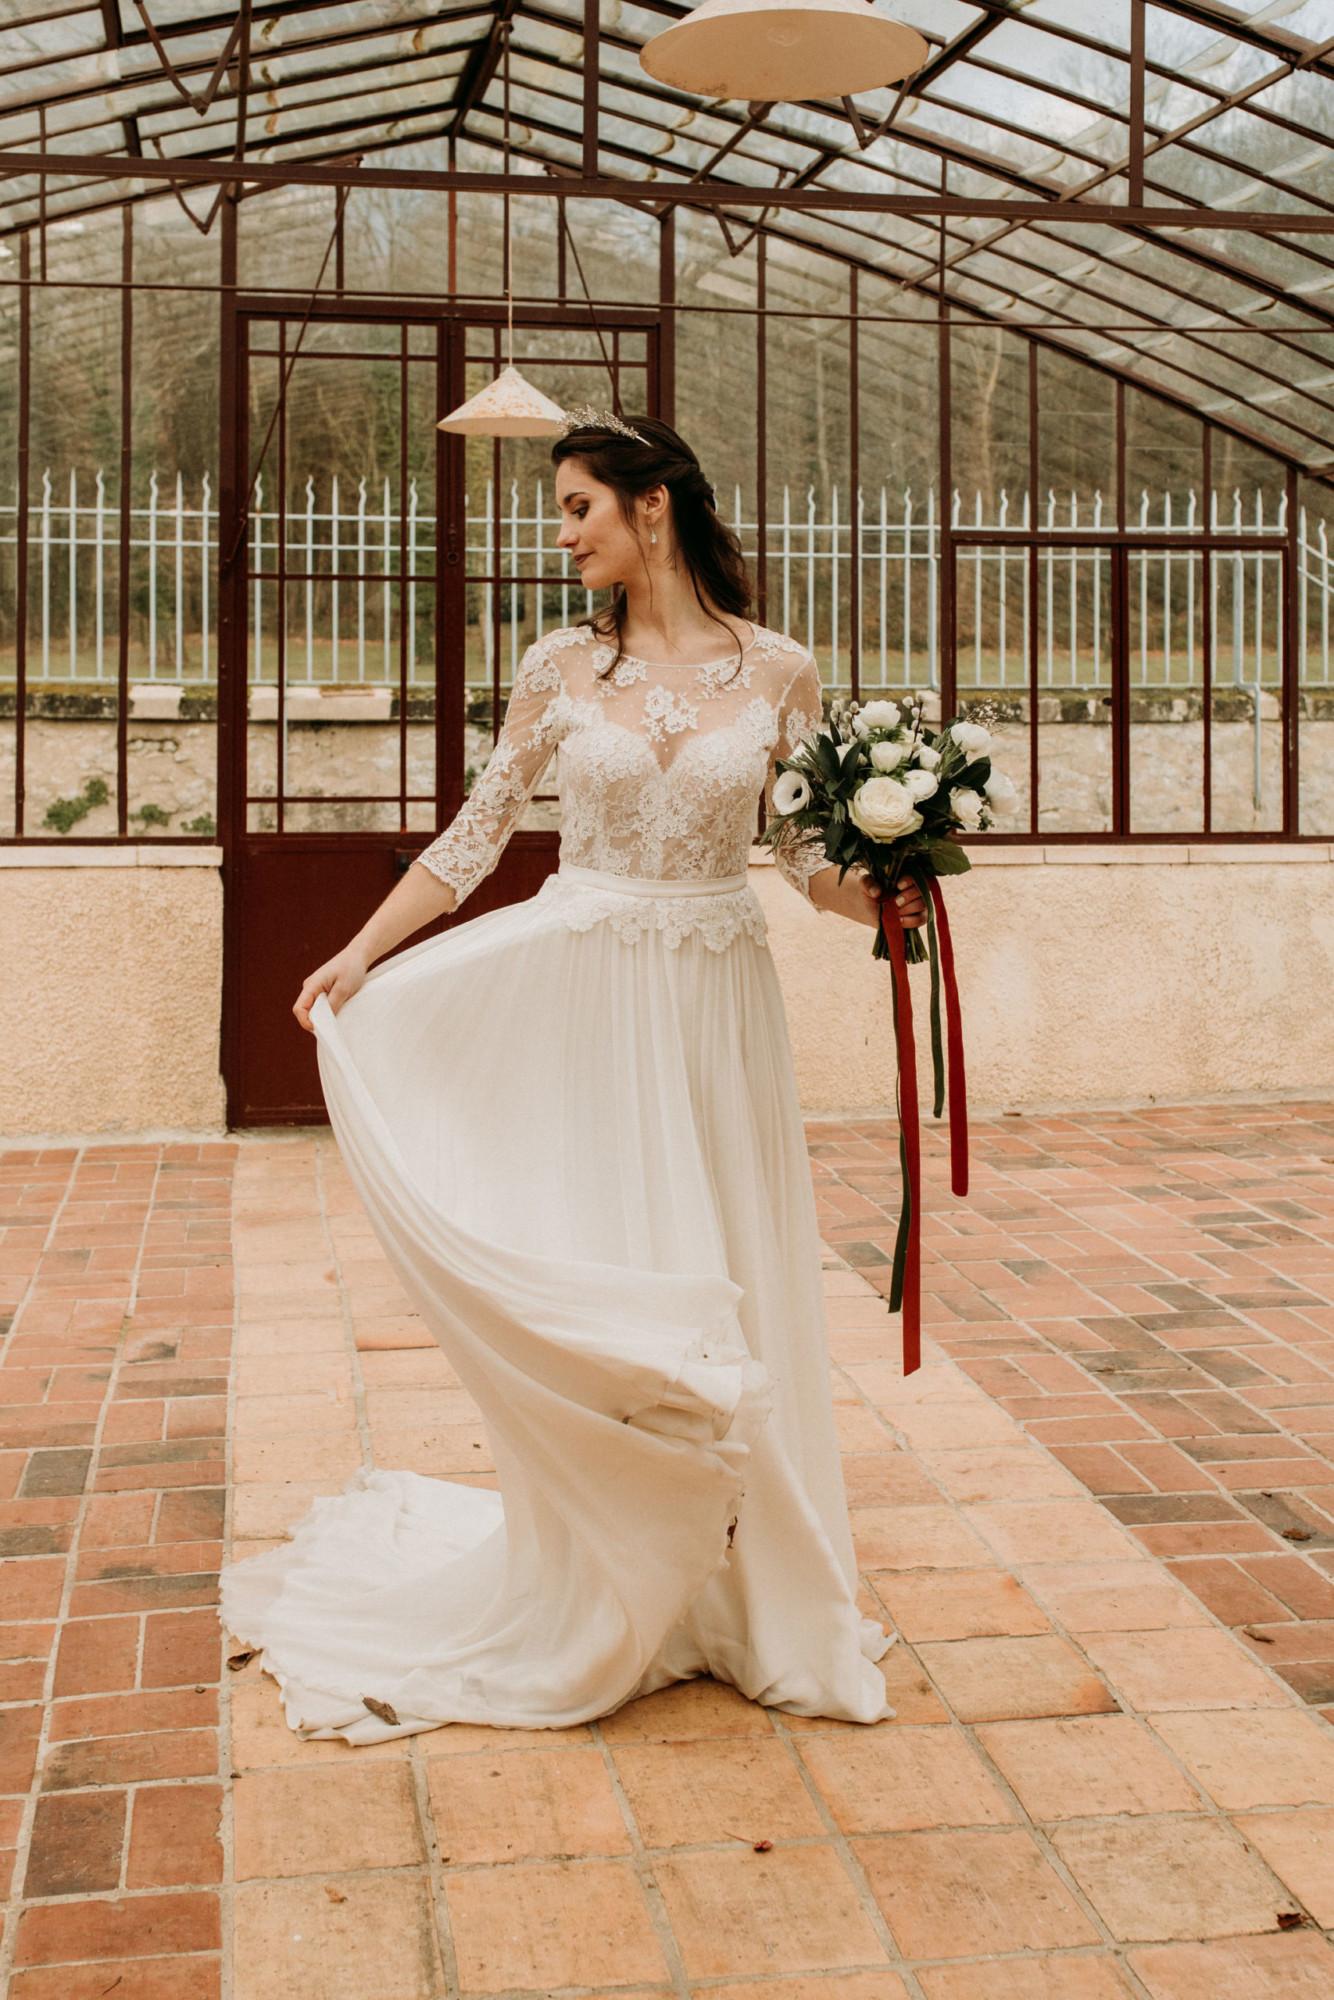 Domaine verderonne mariage danser